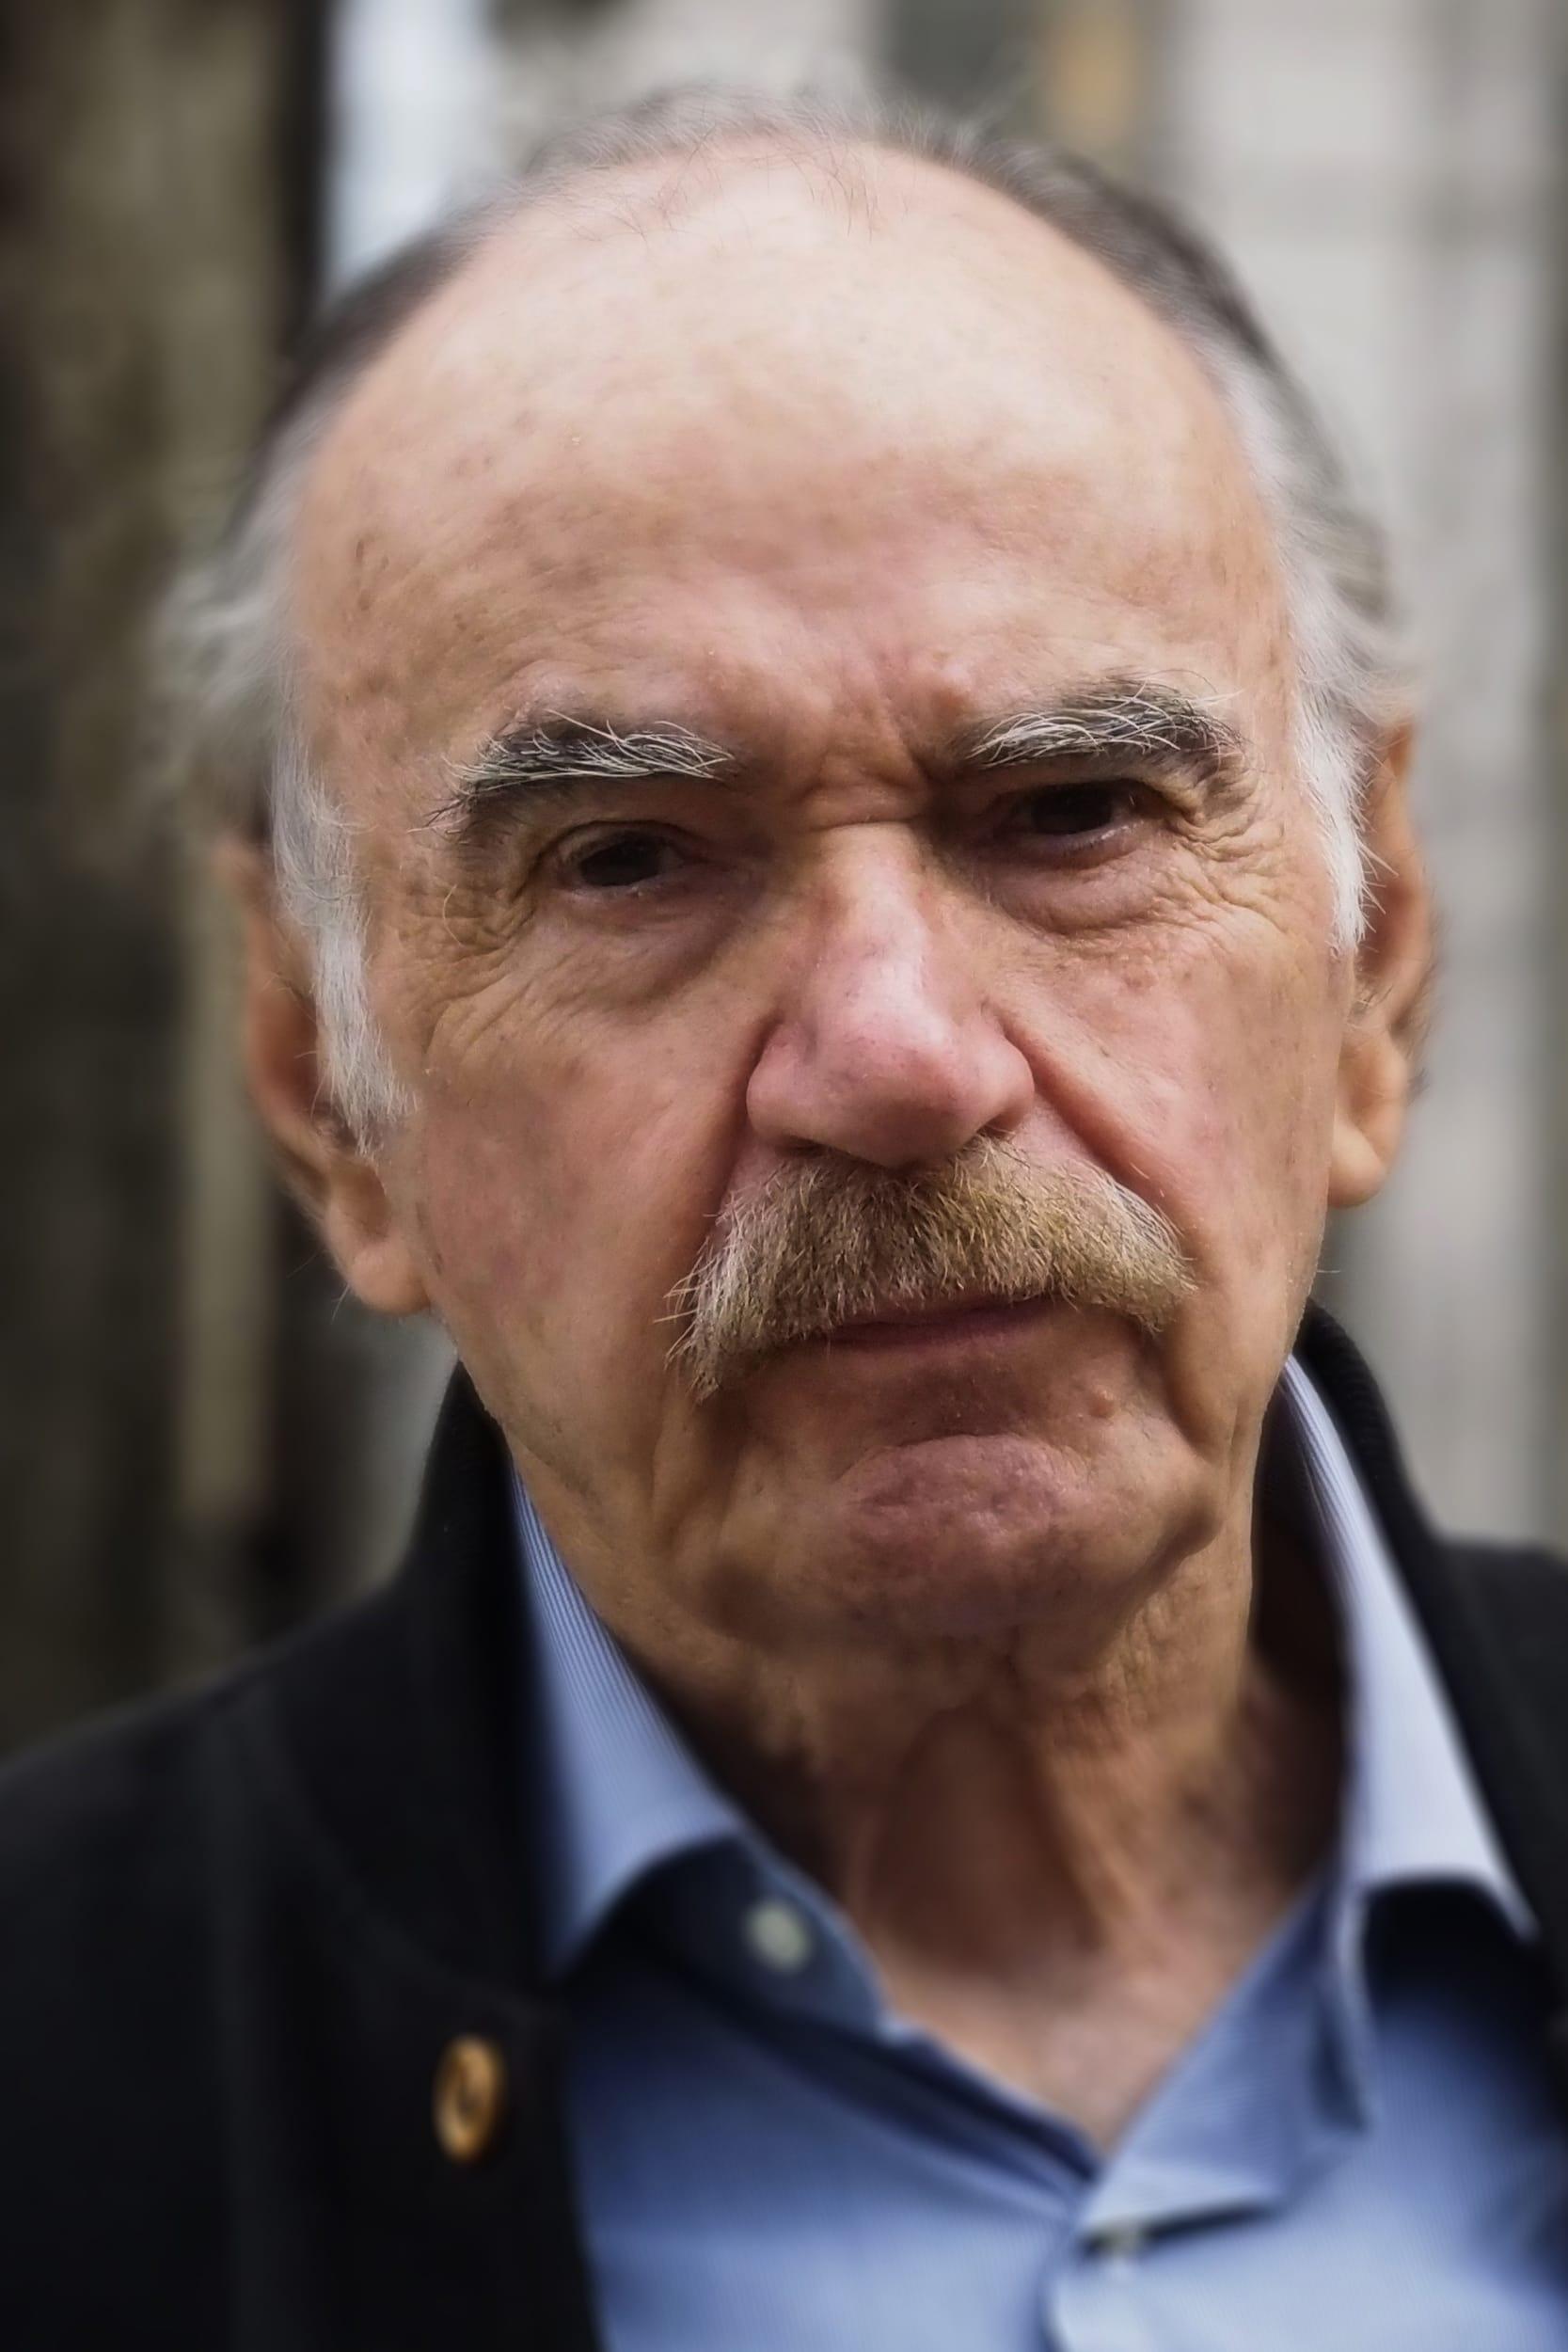 Antonio Salines